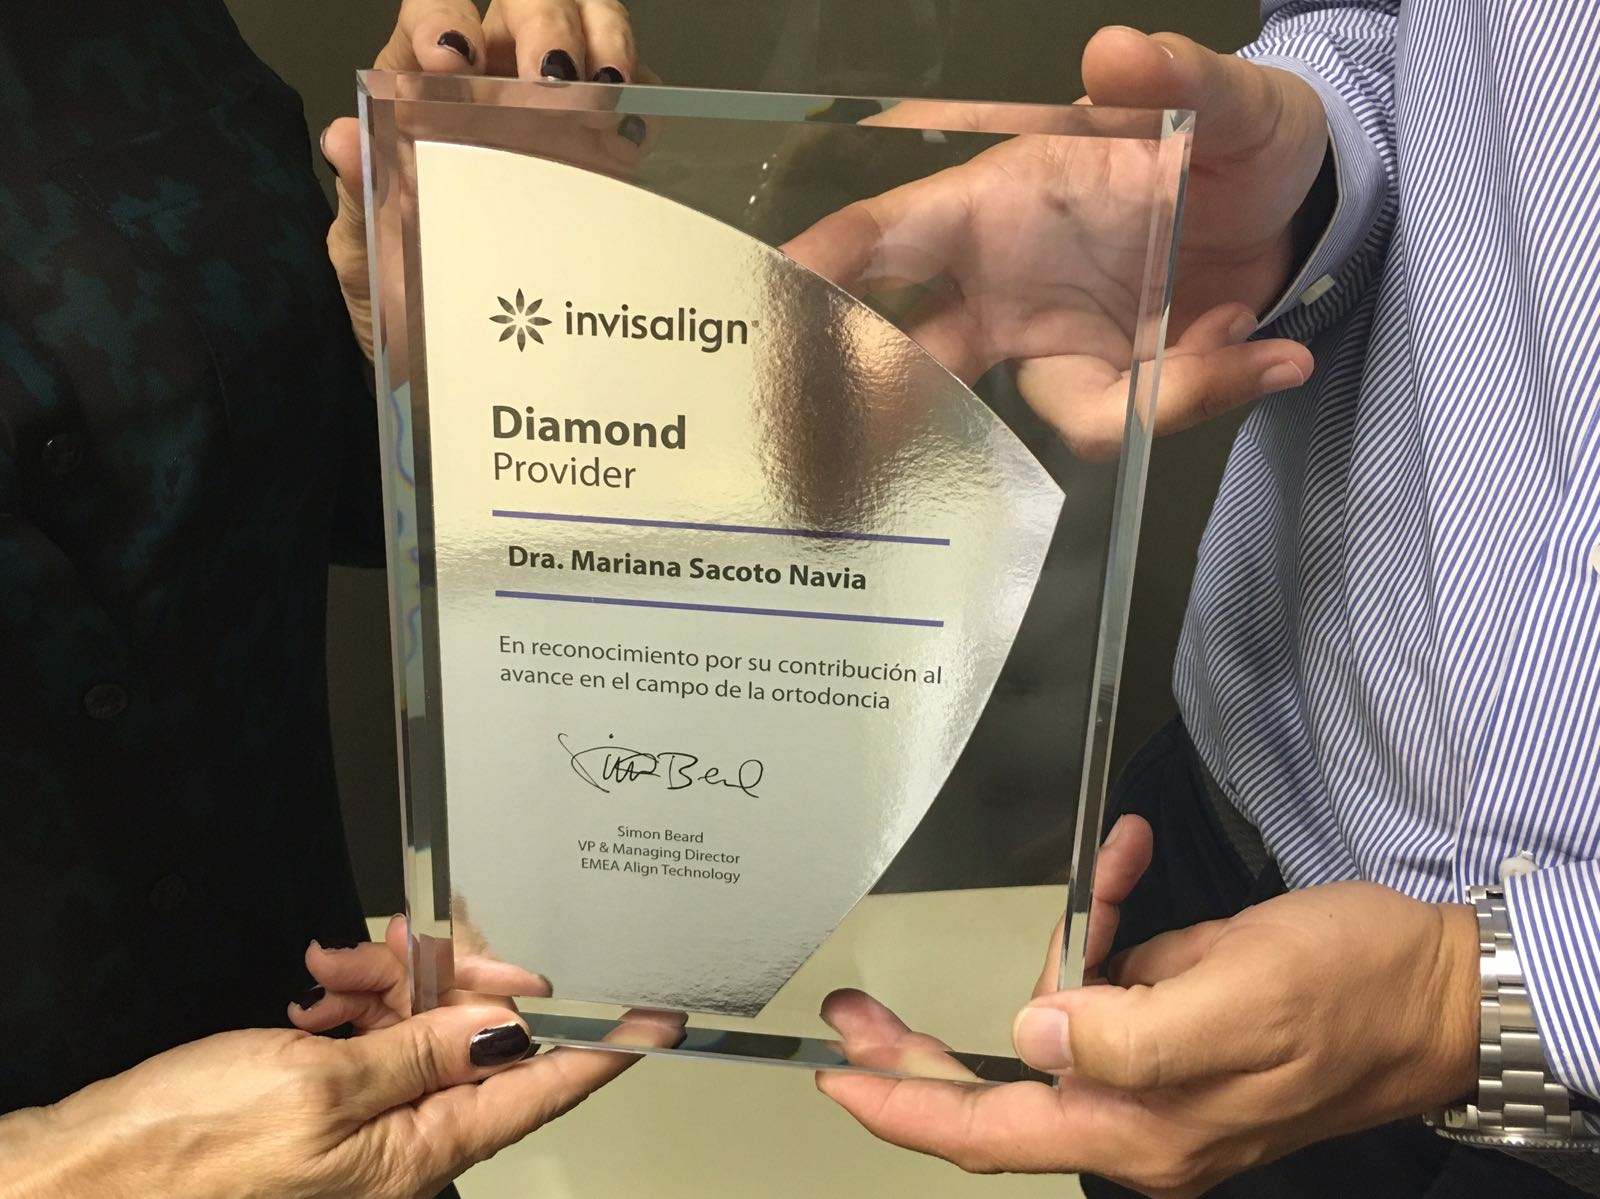 Clinica de Ortodoncia Doctora Mariana Sacoto Navia Invisalign Diamond Provider Expertos en Ortodoncia Digital Barcelona Cornella Terrassa